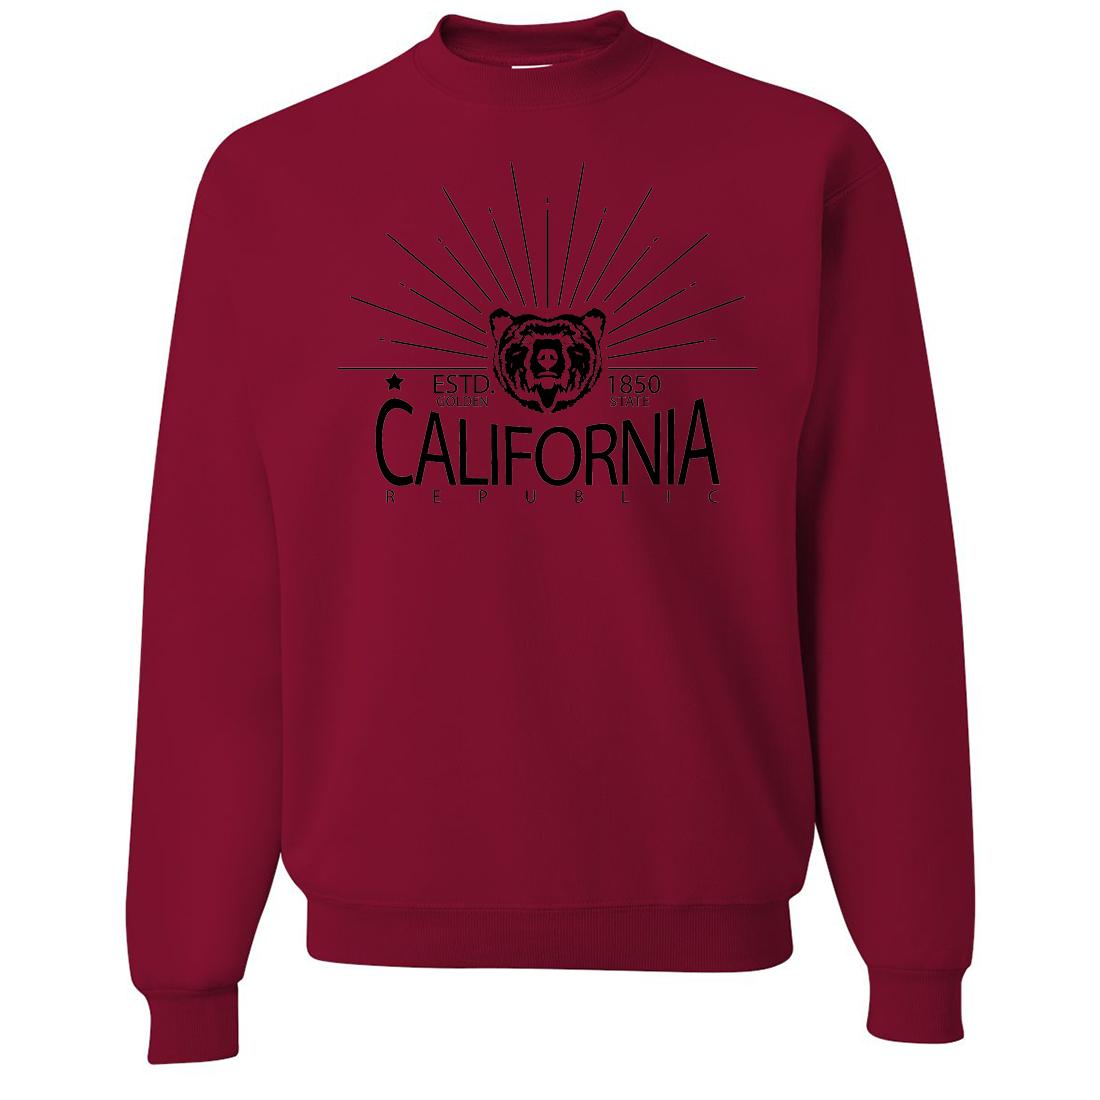 California Golden State Black Print Crewneck Sweatshirt